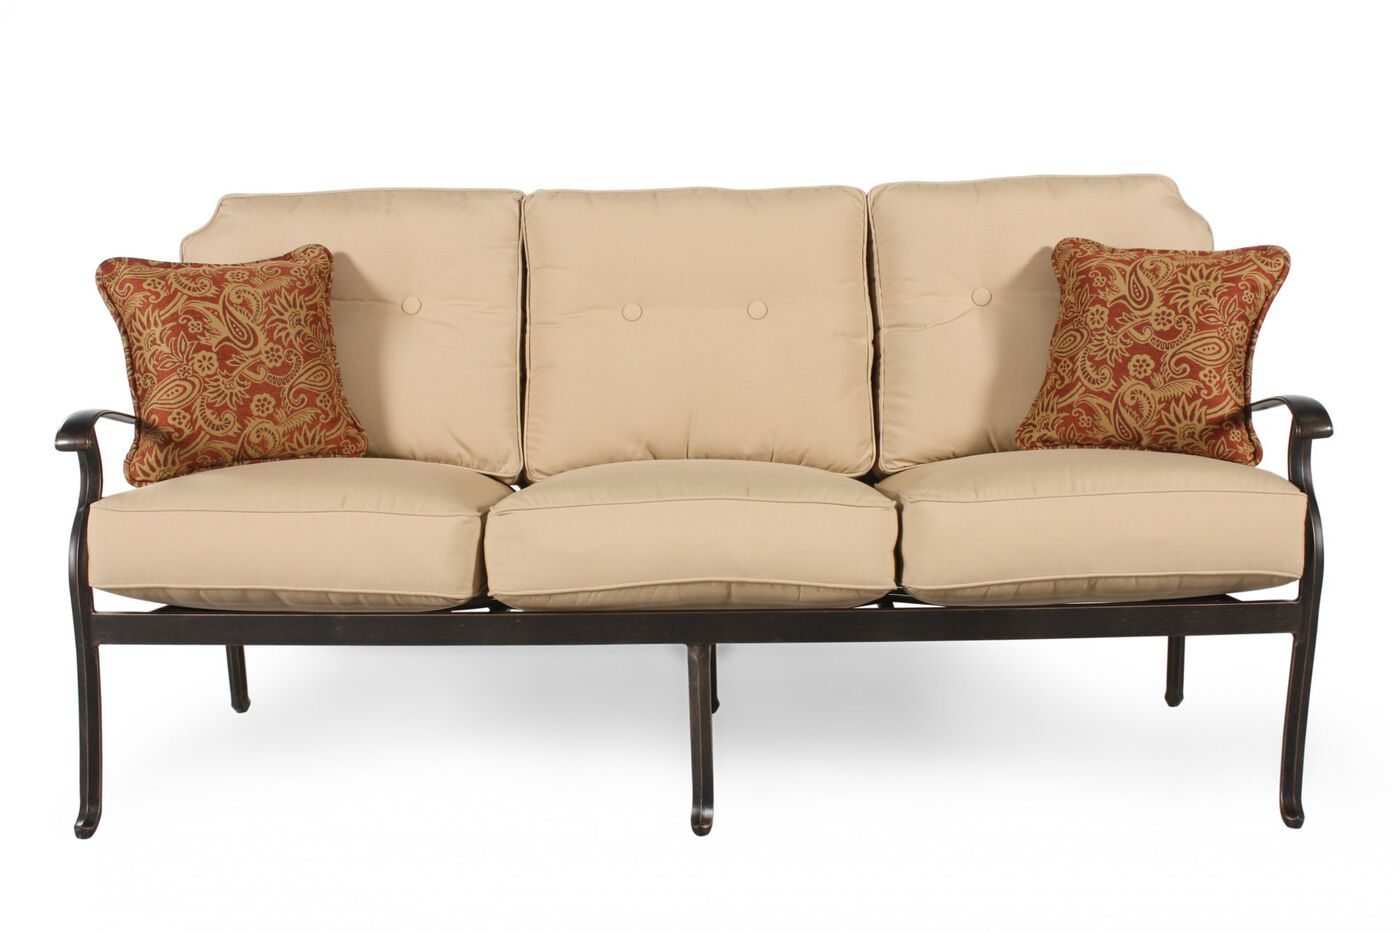 agio heritage select patio sofa mathis brothers furniture